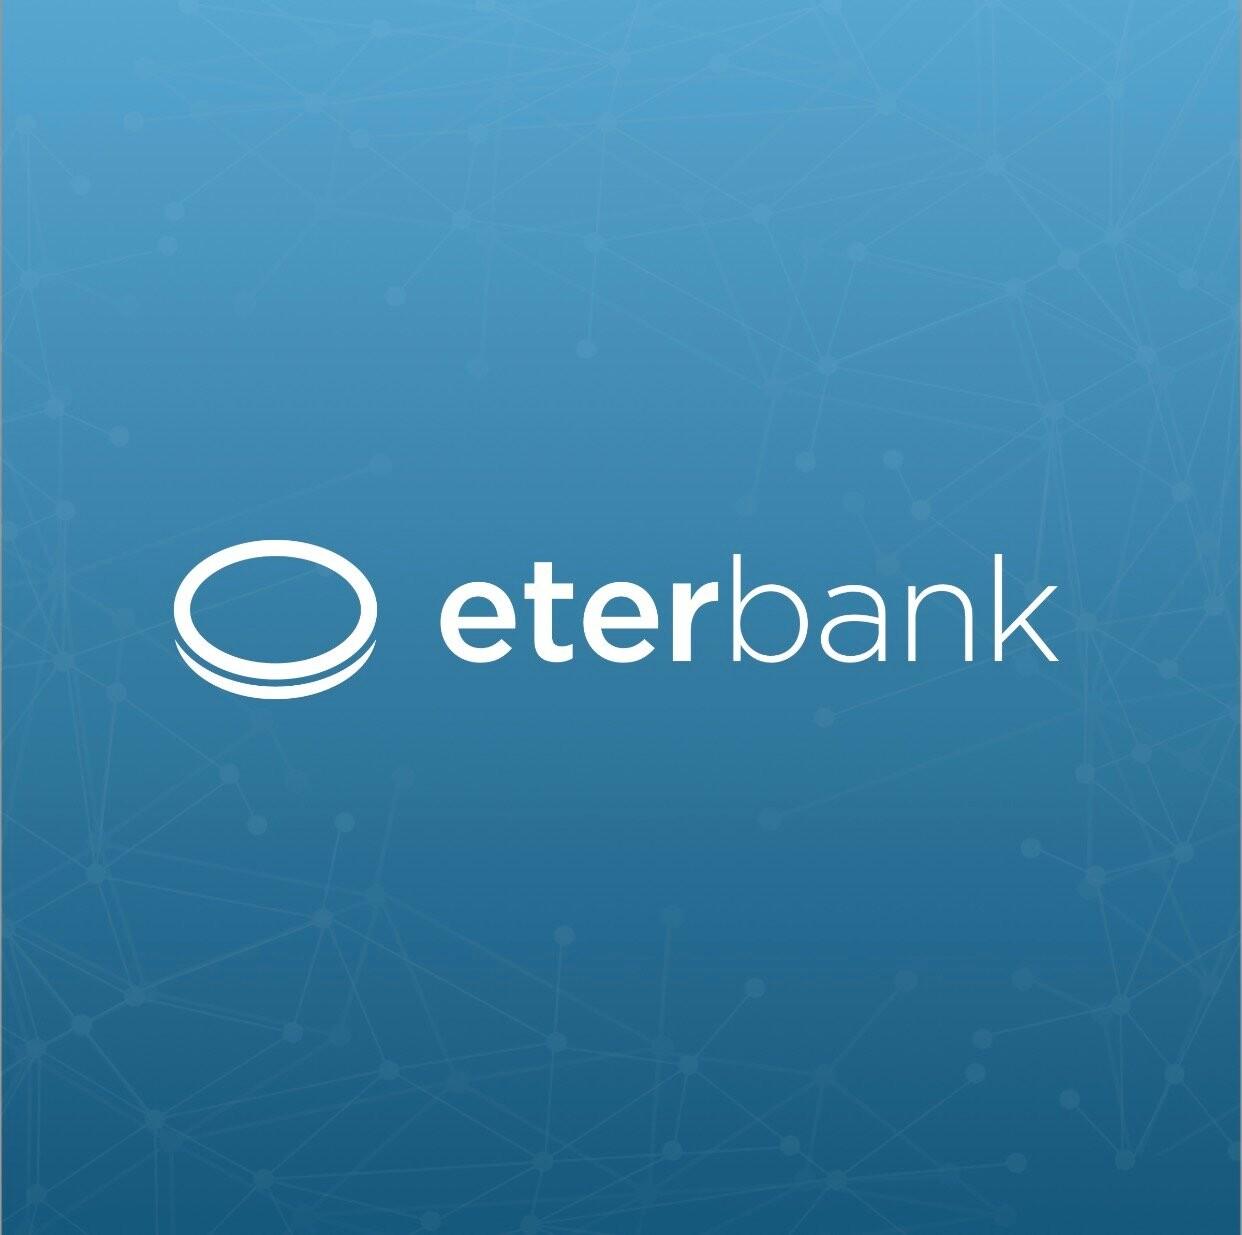 Eterbank